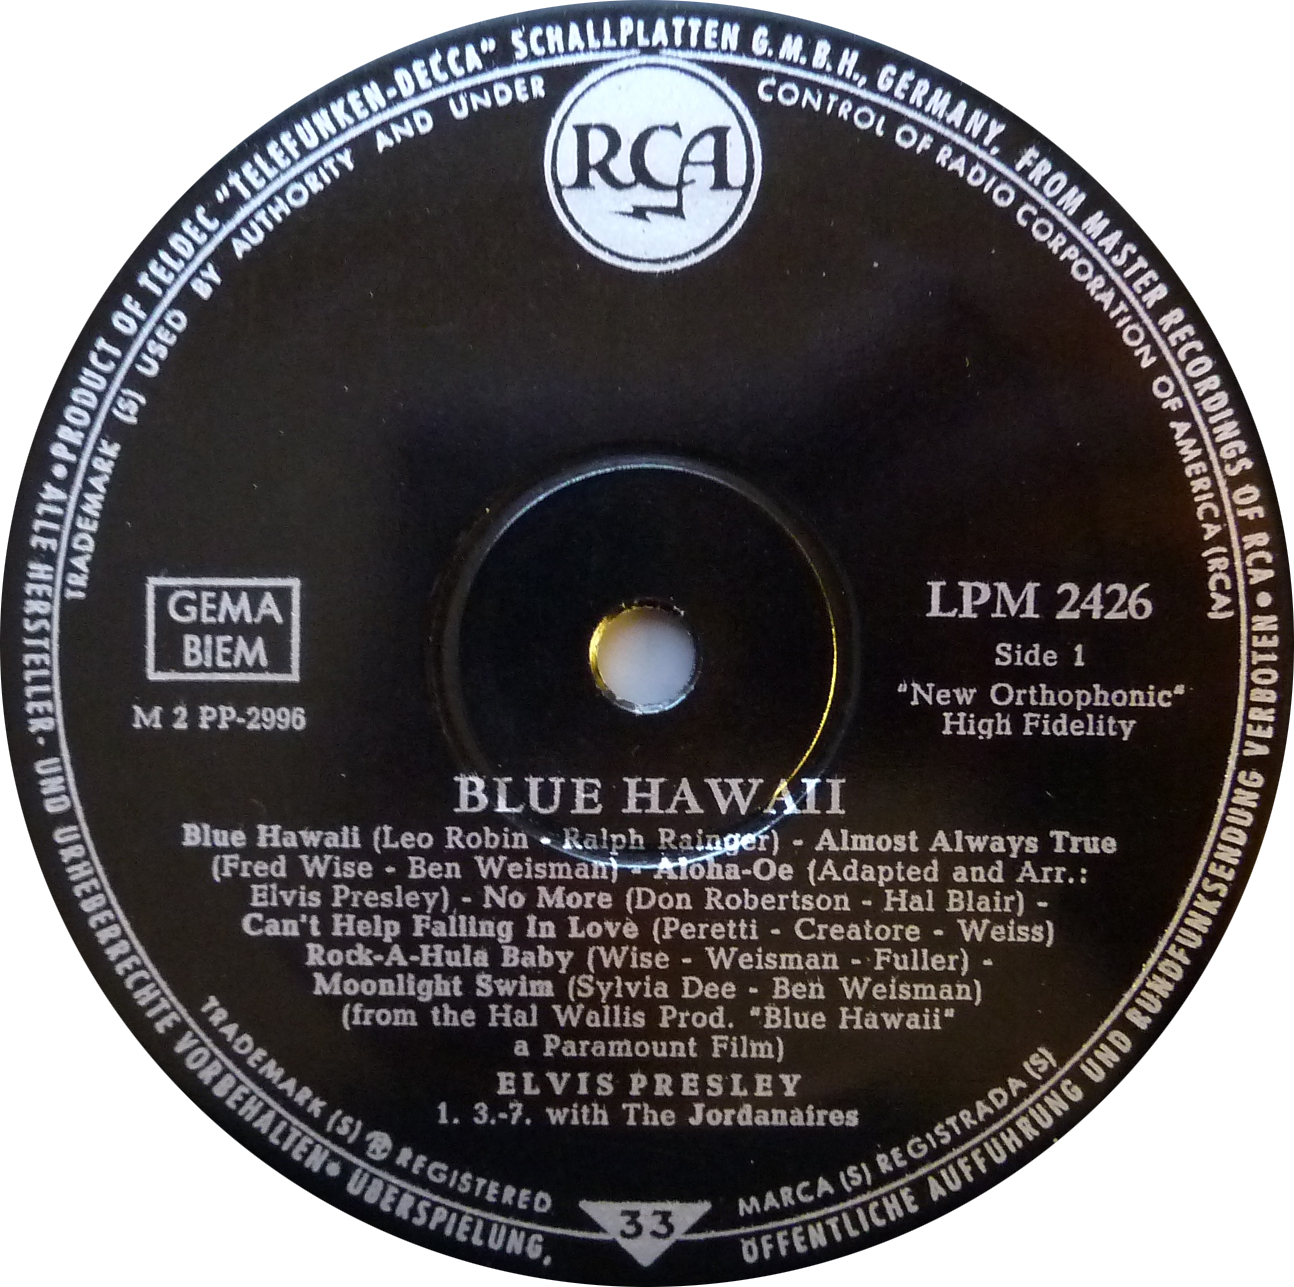 BLUE HAWAII Bluehawaii_1961_lpm_slakkg